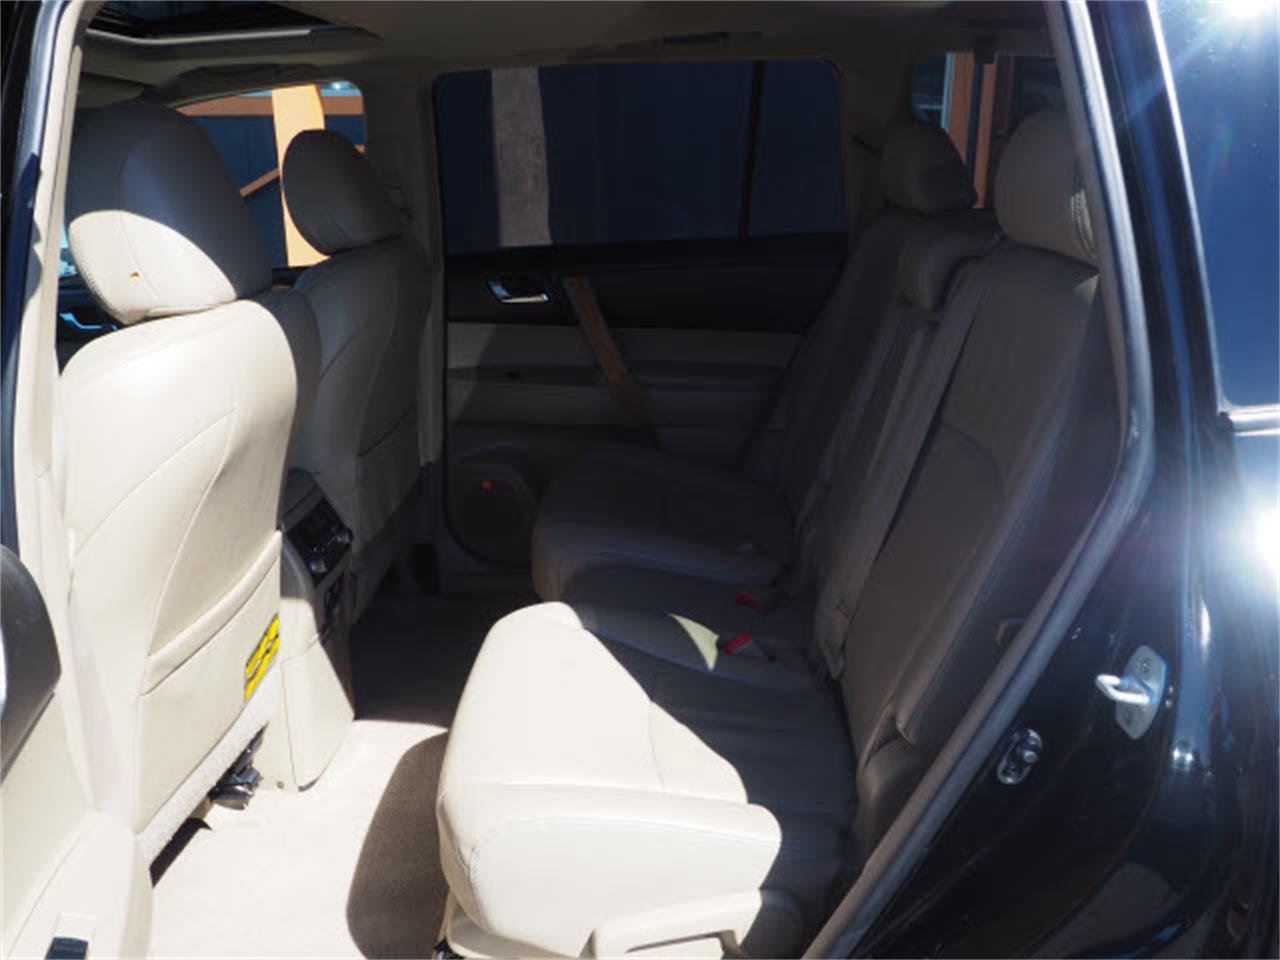 2010 Toyota Highlander (CC-1381997) for sale in Tacoma, Washington